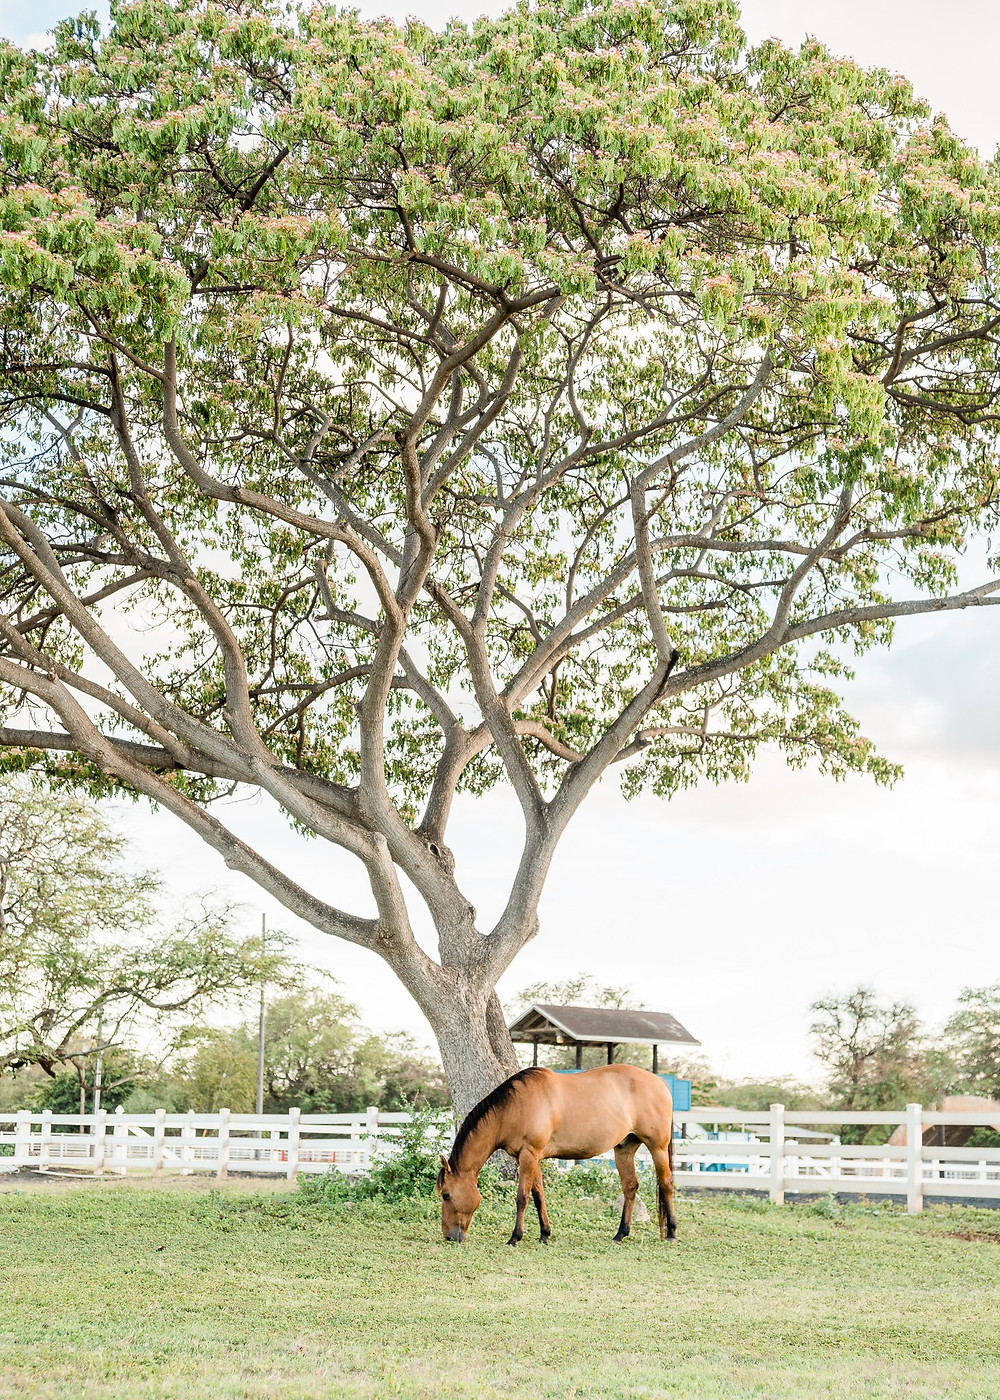 Rocky, Lindsey's dun quarter horse, grazing under the monkey pod tree in Kapolei, Hawaii